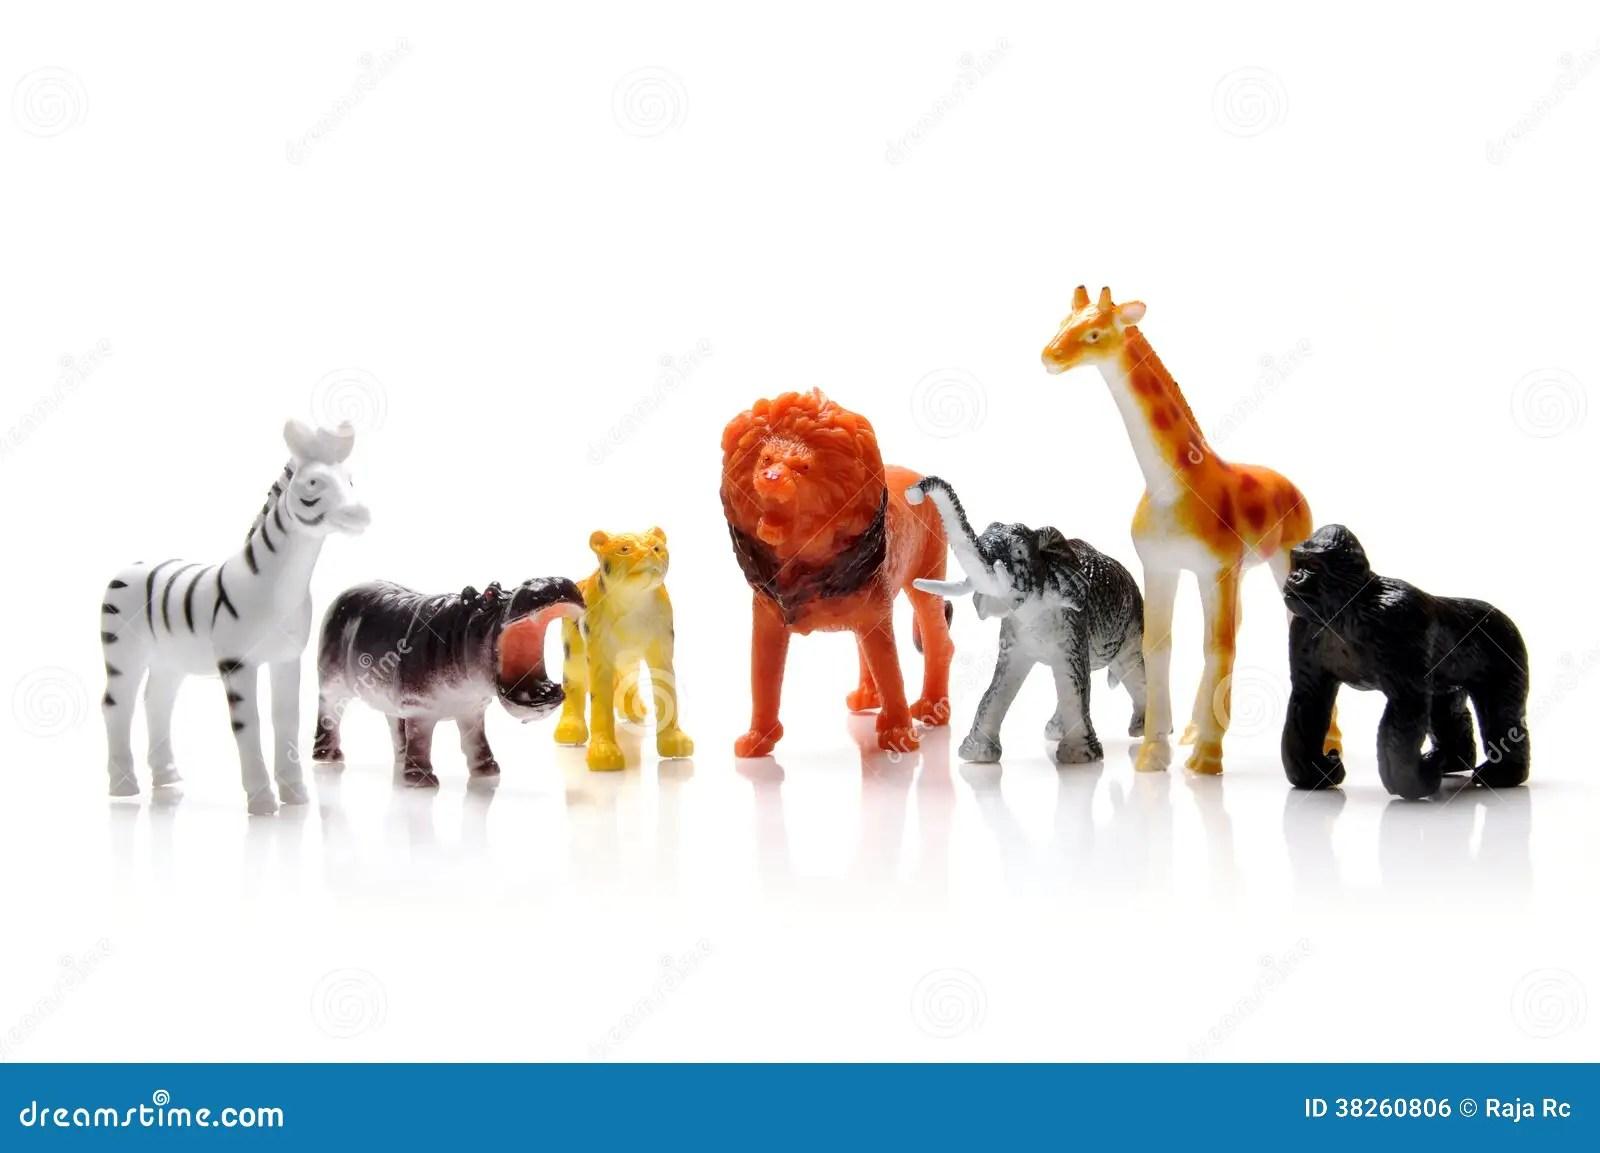 Toy Animals Royalty Free Stock Image Image 38260806